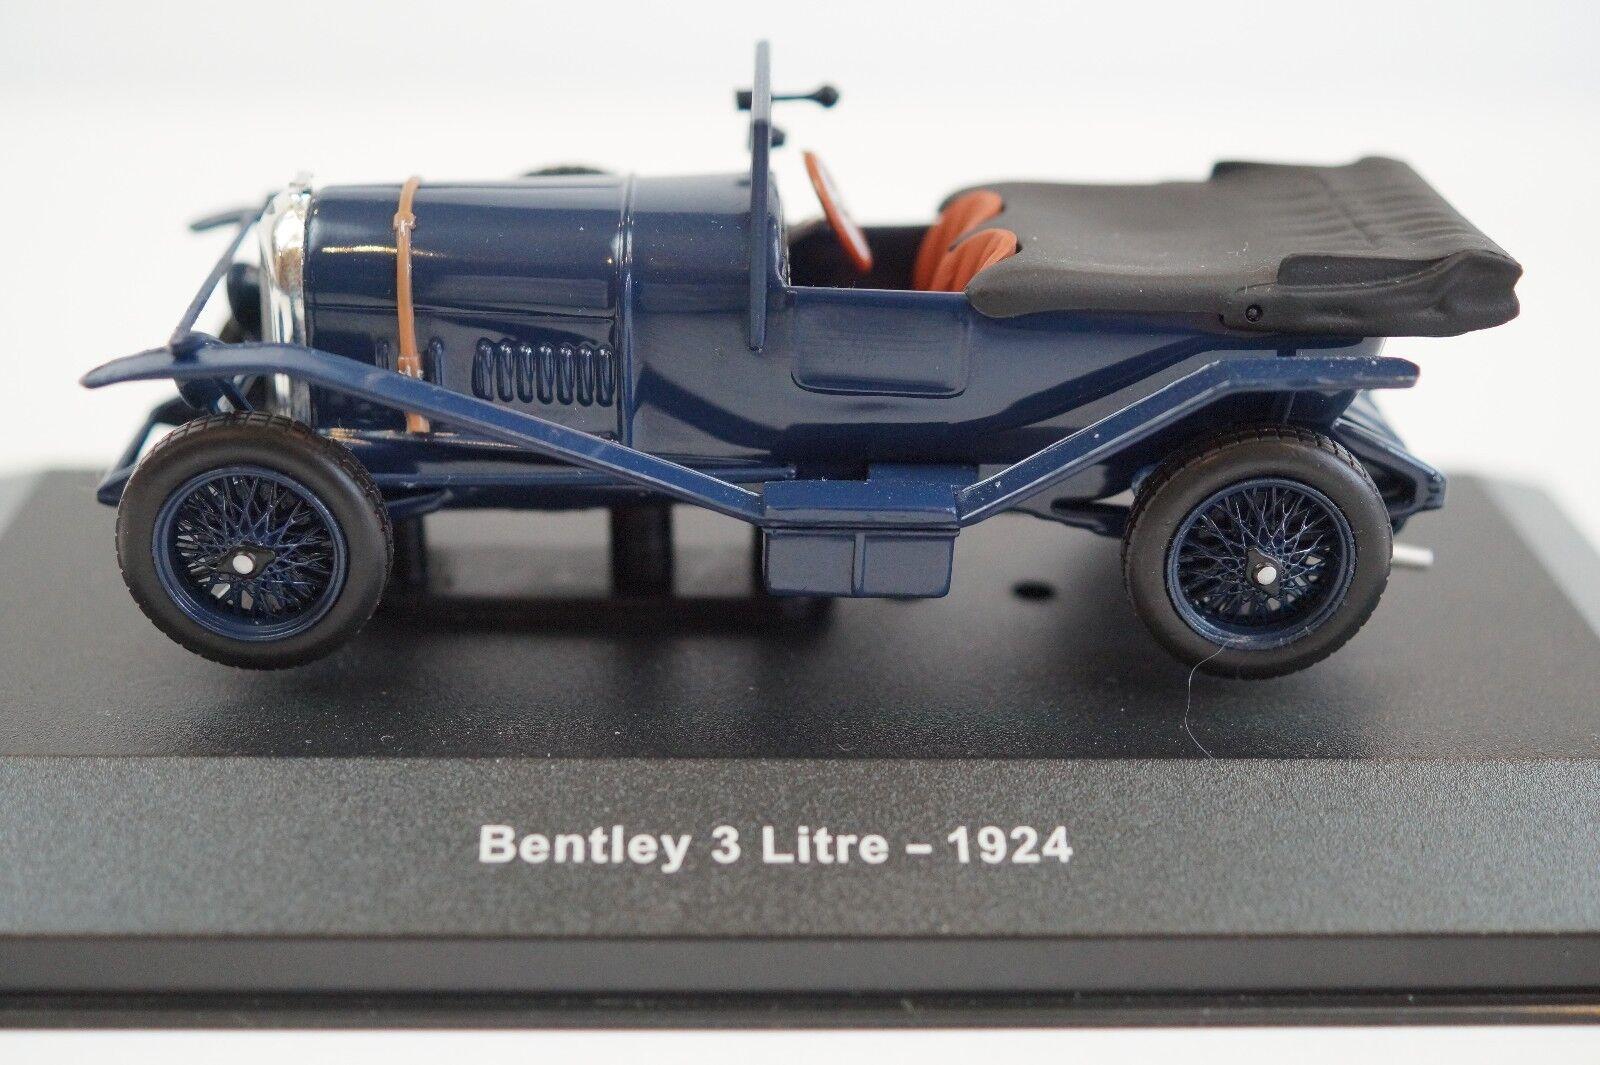 Bentley 3 Litre - 1924 by IXO in  Scale - azul